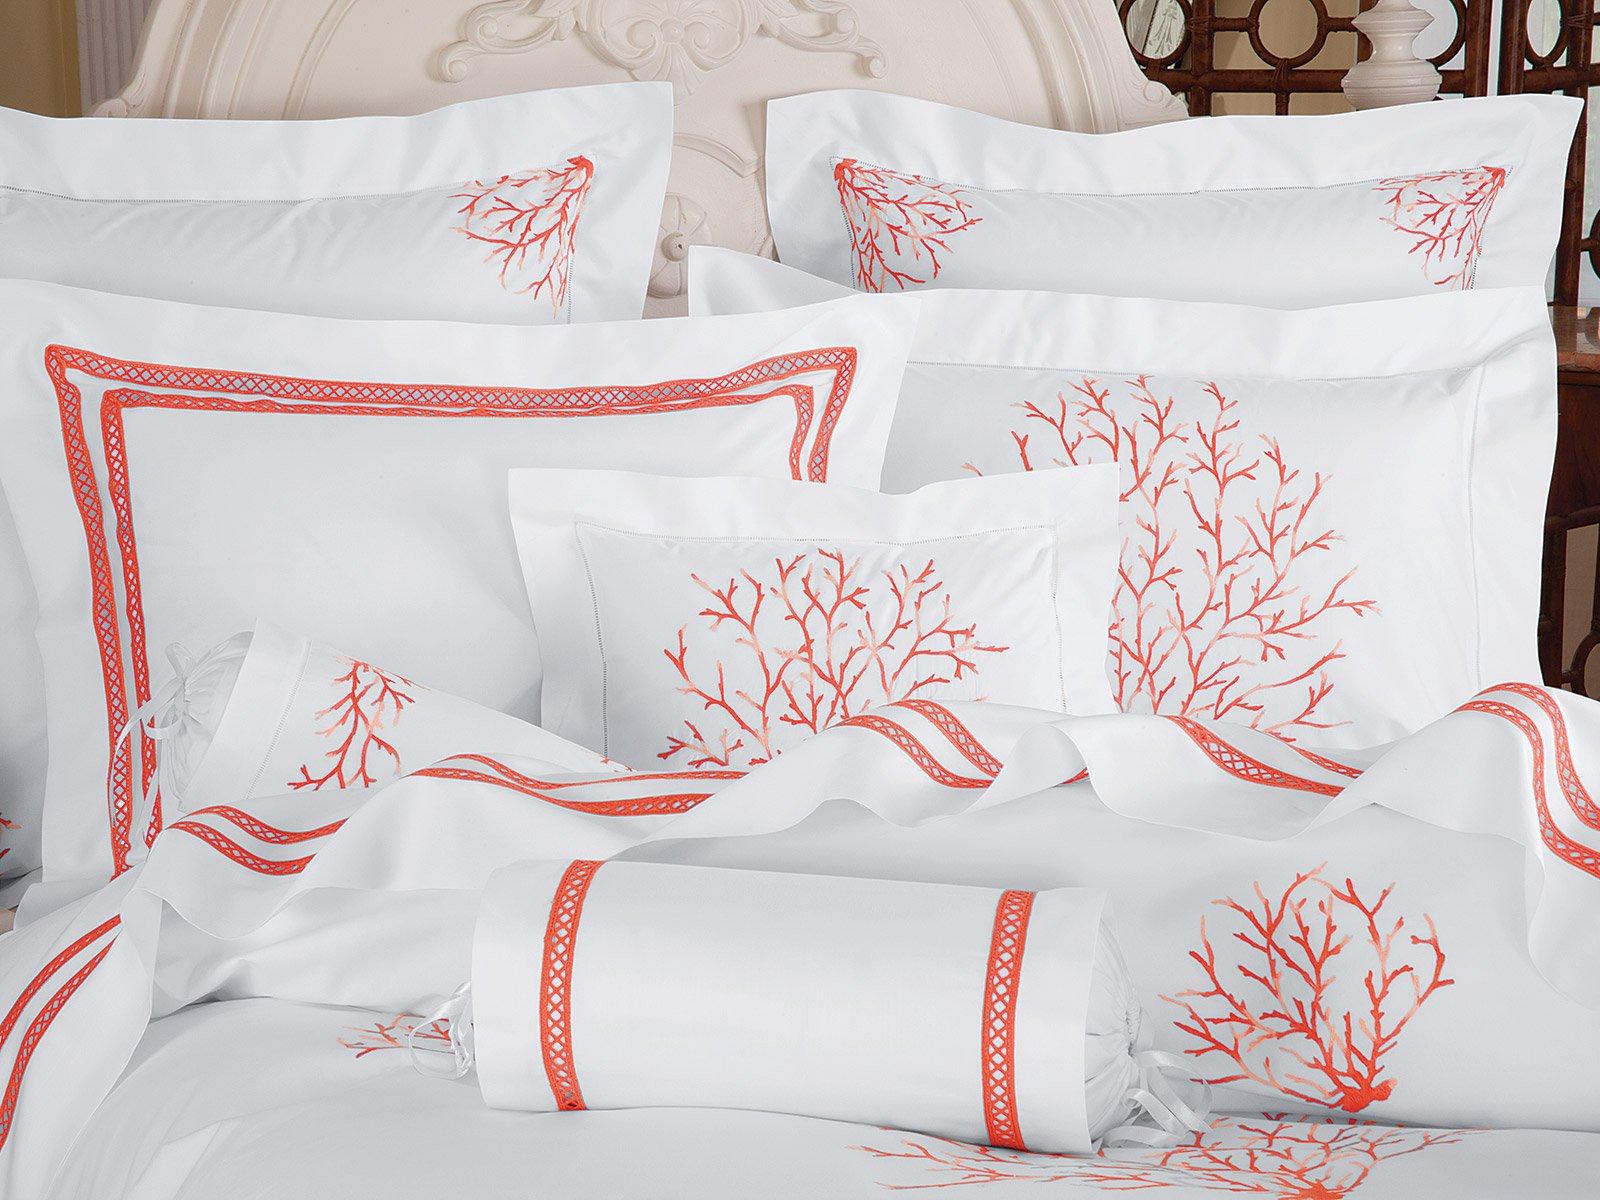 Coral Sea Luxury Bedding Italian Bed Linens